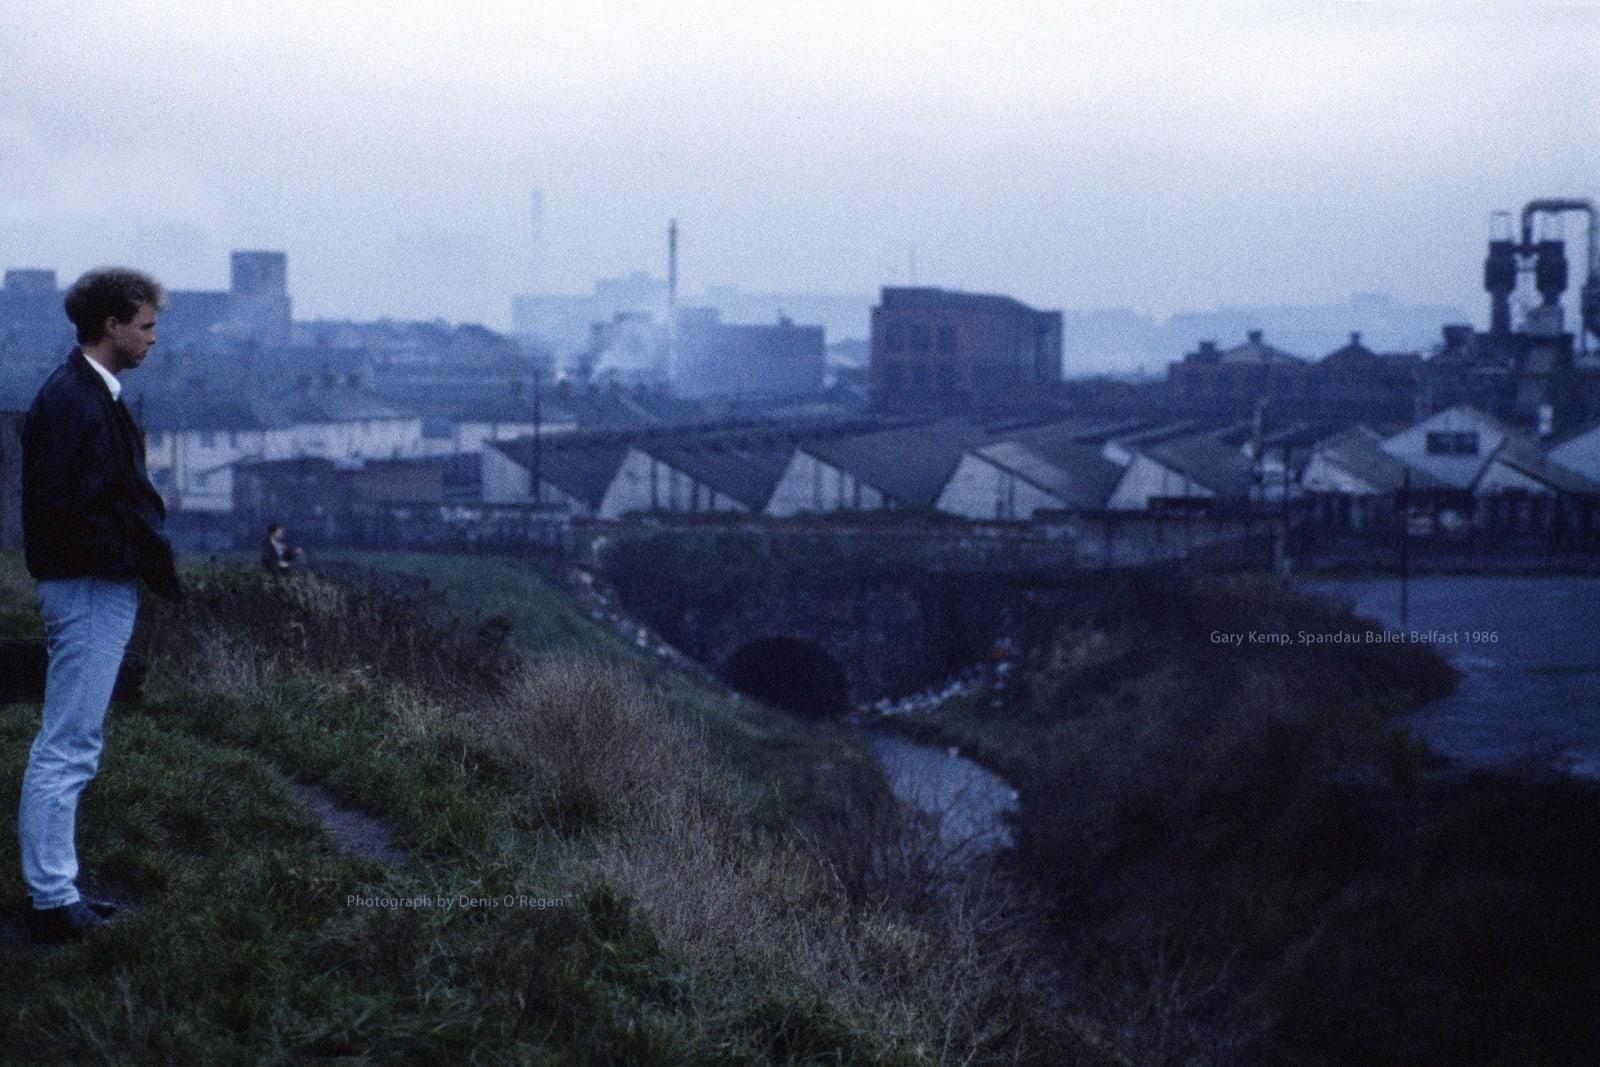 SPANDAU BALLET, Gary Kemp Belfast, 1986